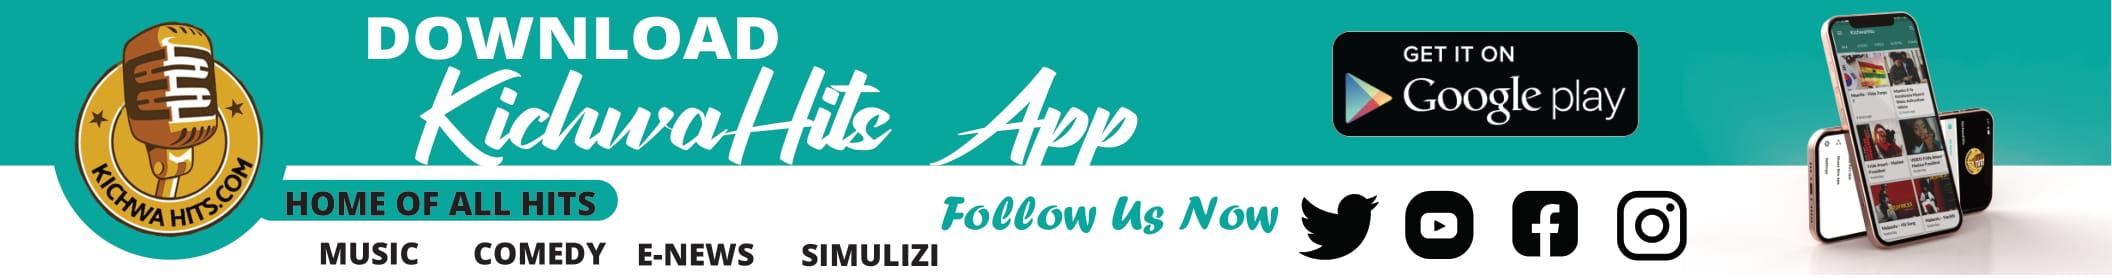 https://play.google.com/store/apps/details?id=com.kichwahits.app&hl=en&gl=US